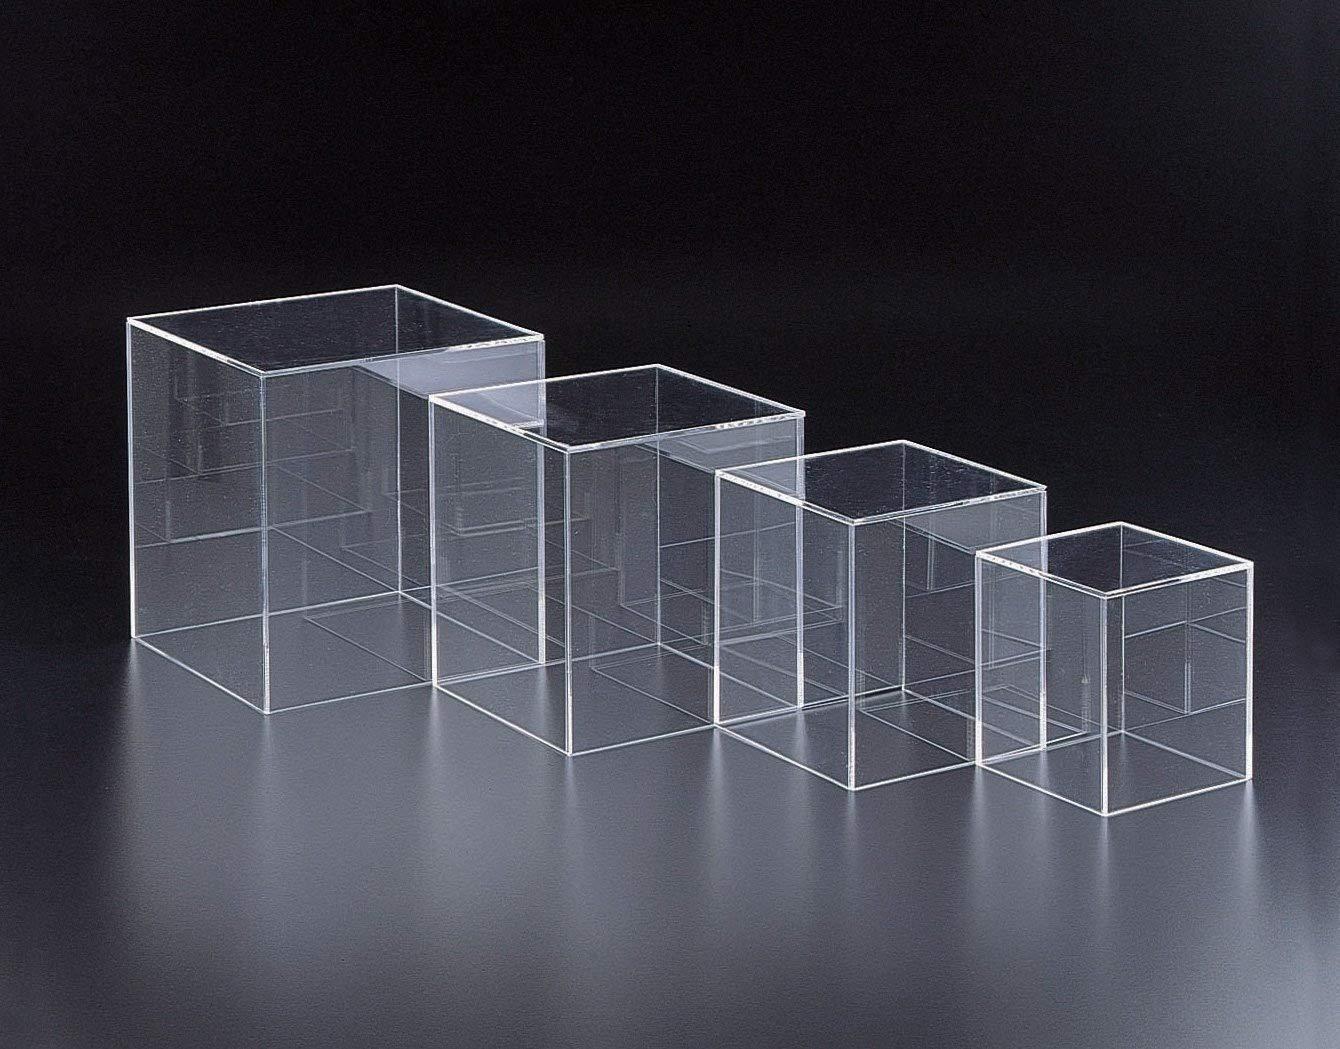 Marketing Holders Clear Acrylic 5 Sided Display Decor Riser Cube Box (1, 5''w)